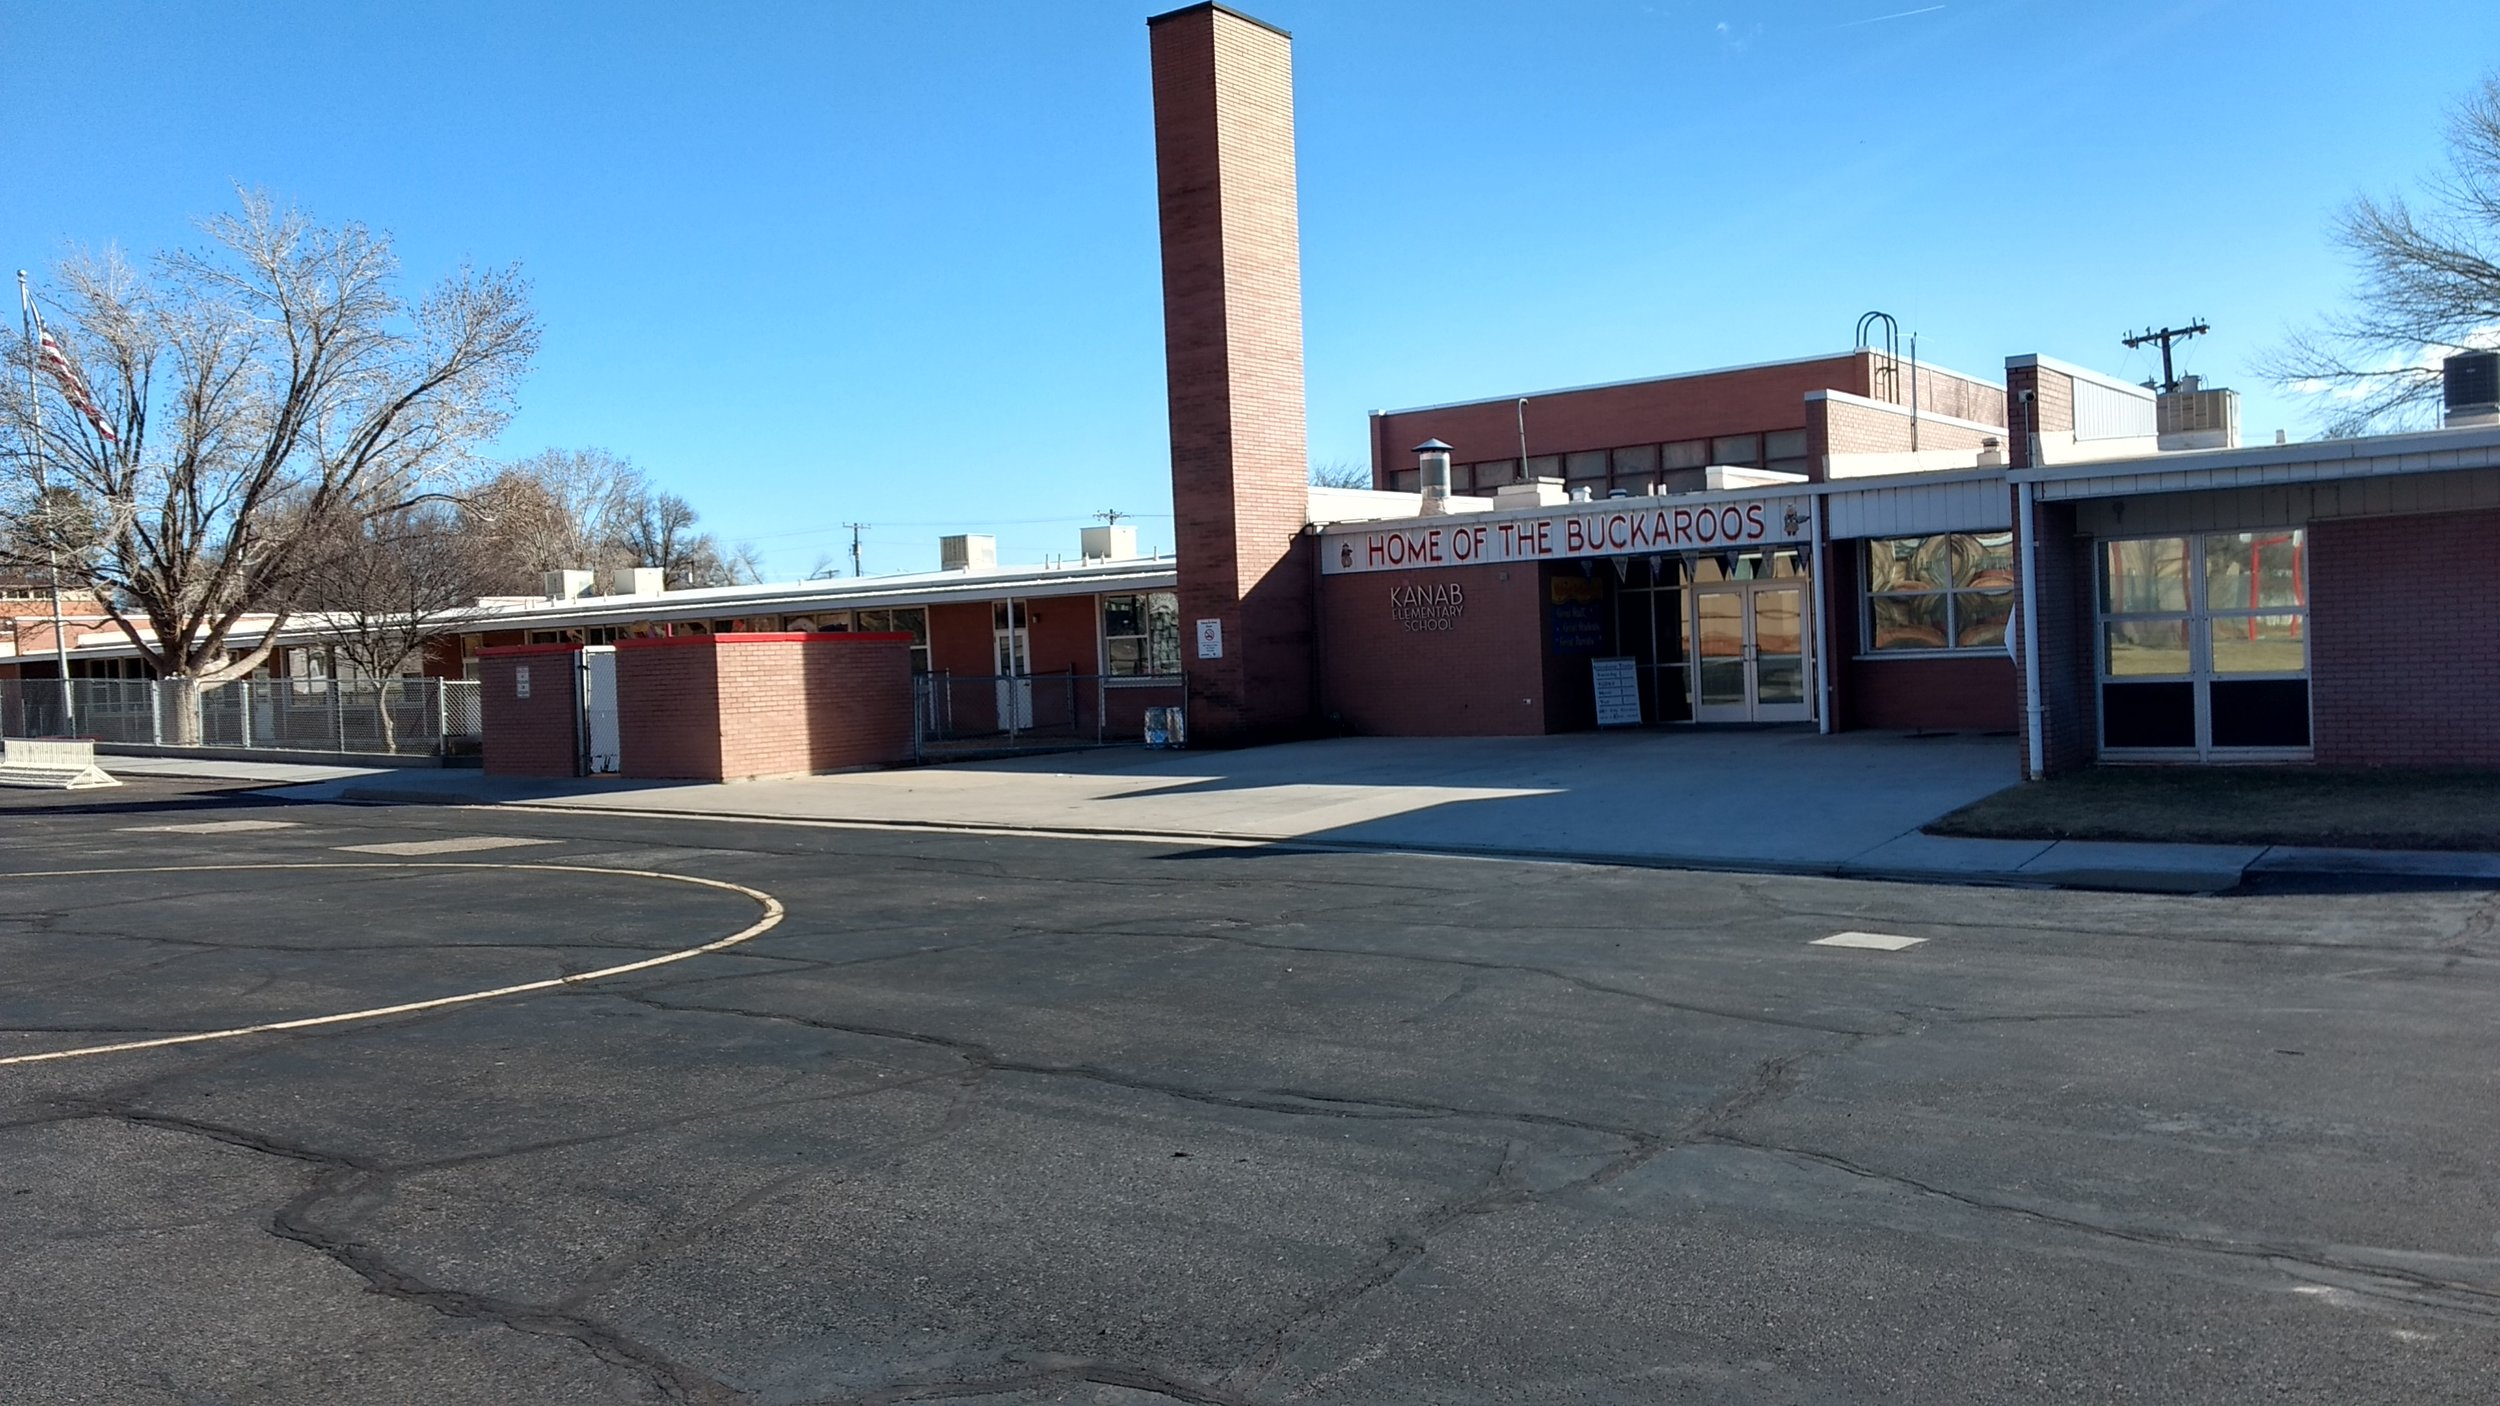 Kanab Elementary School